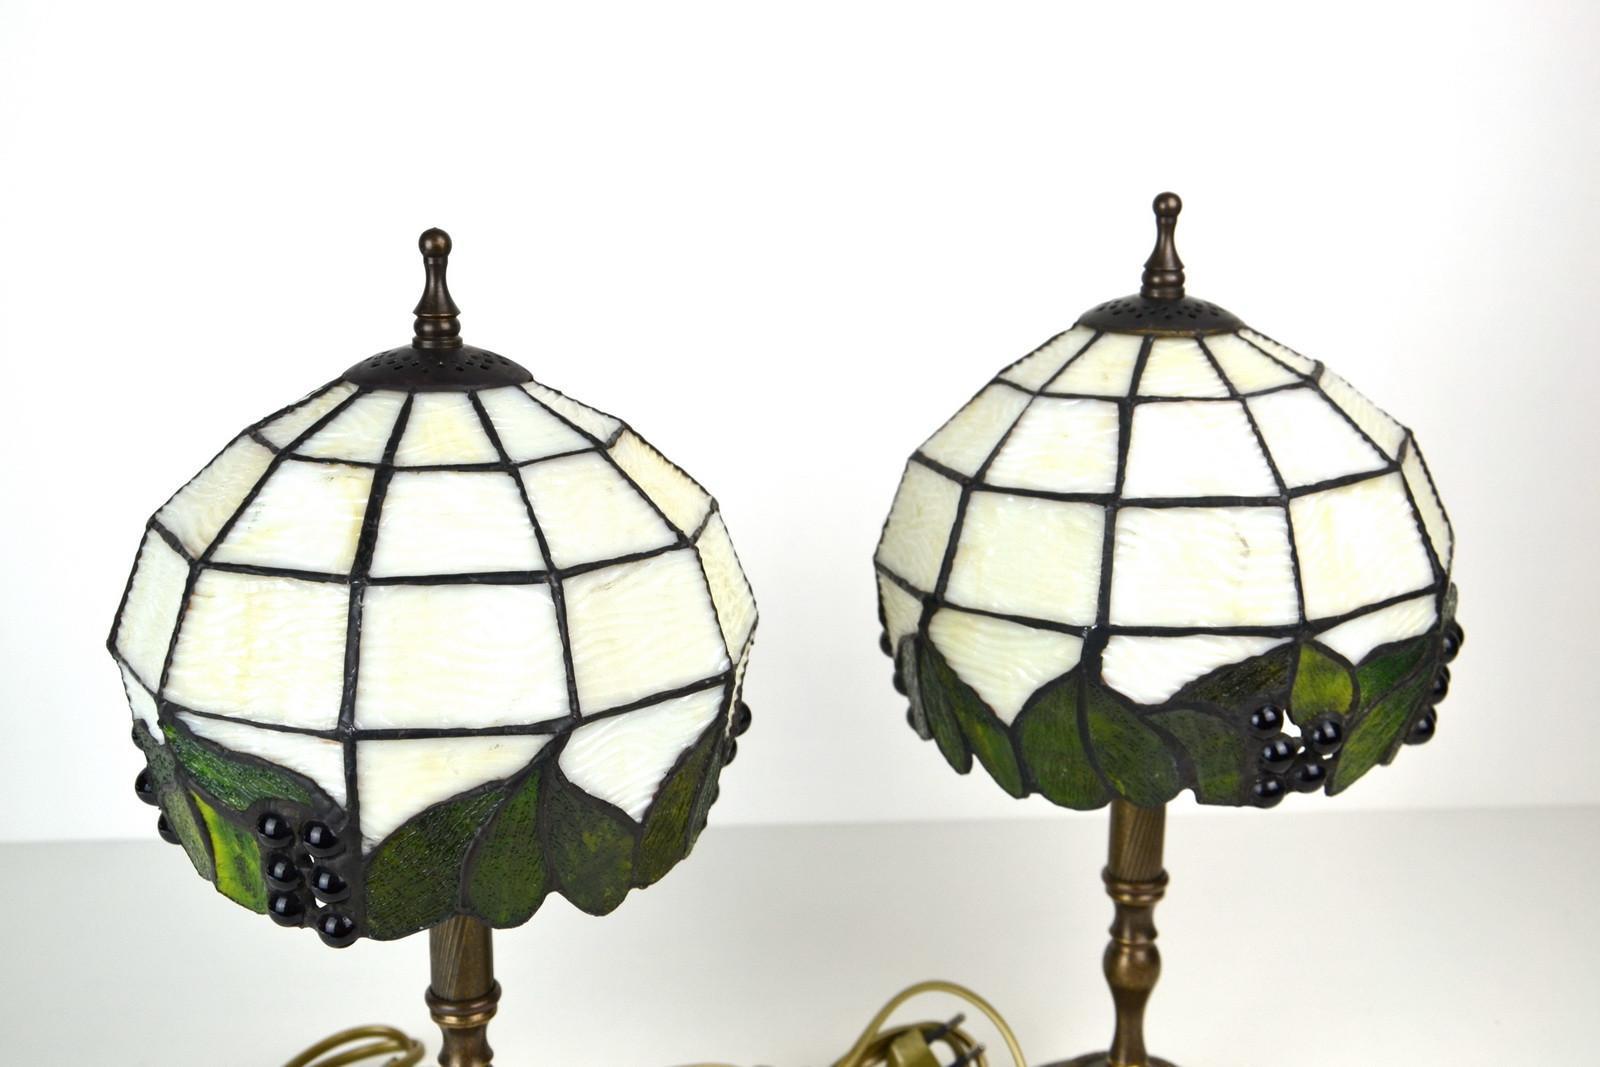 coppia-lampade-tiffany-comodino-10,1567.jpg?WebbinsCacheCounter=1